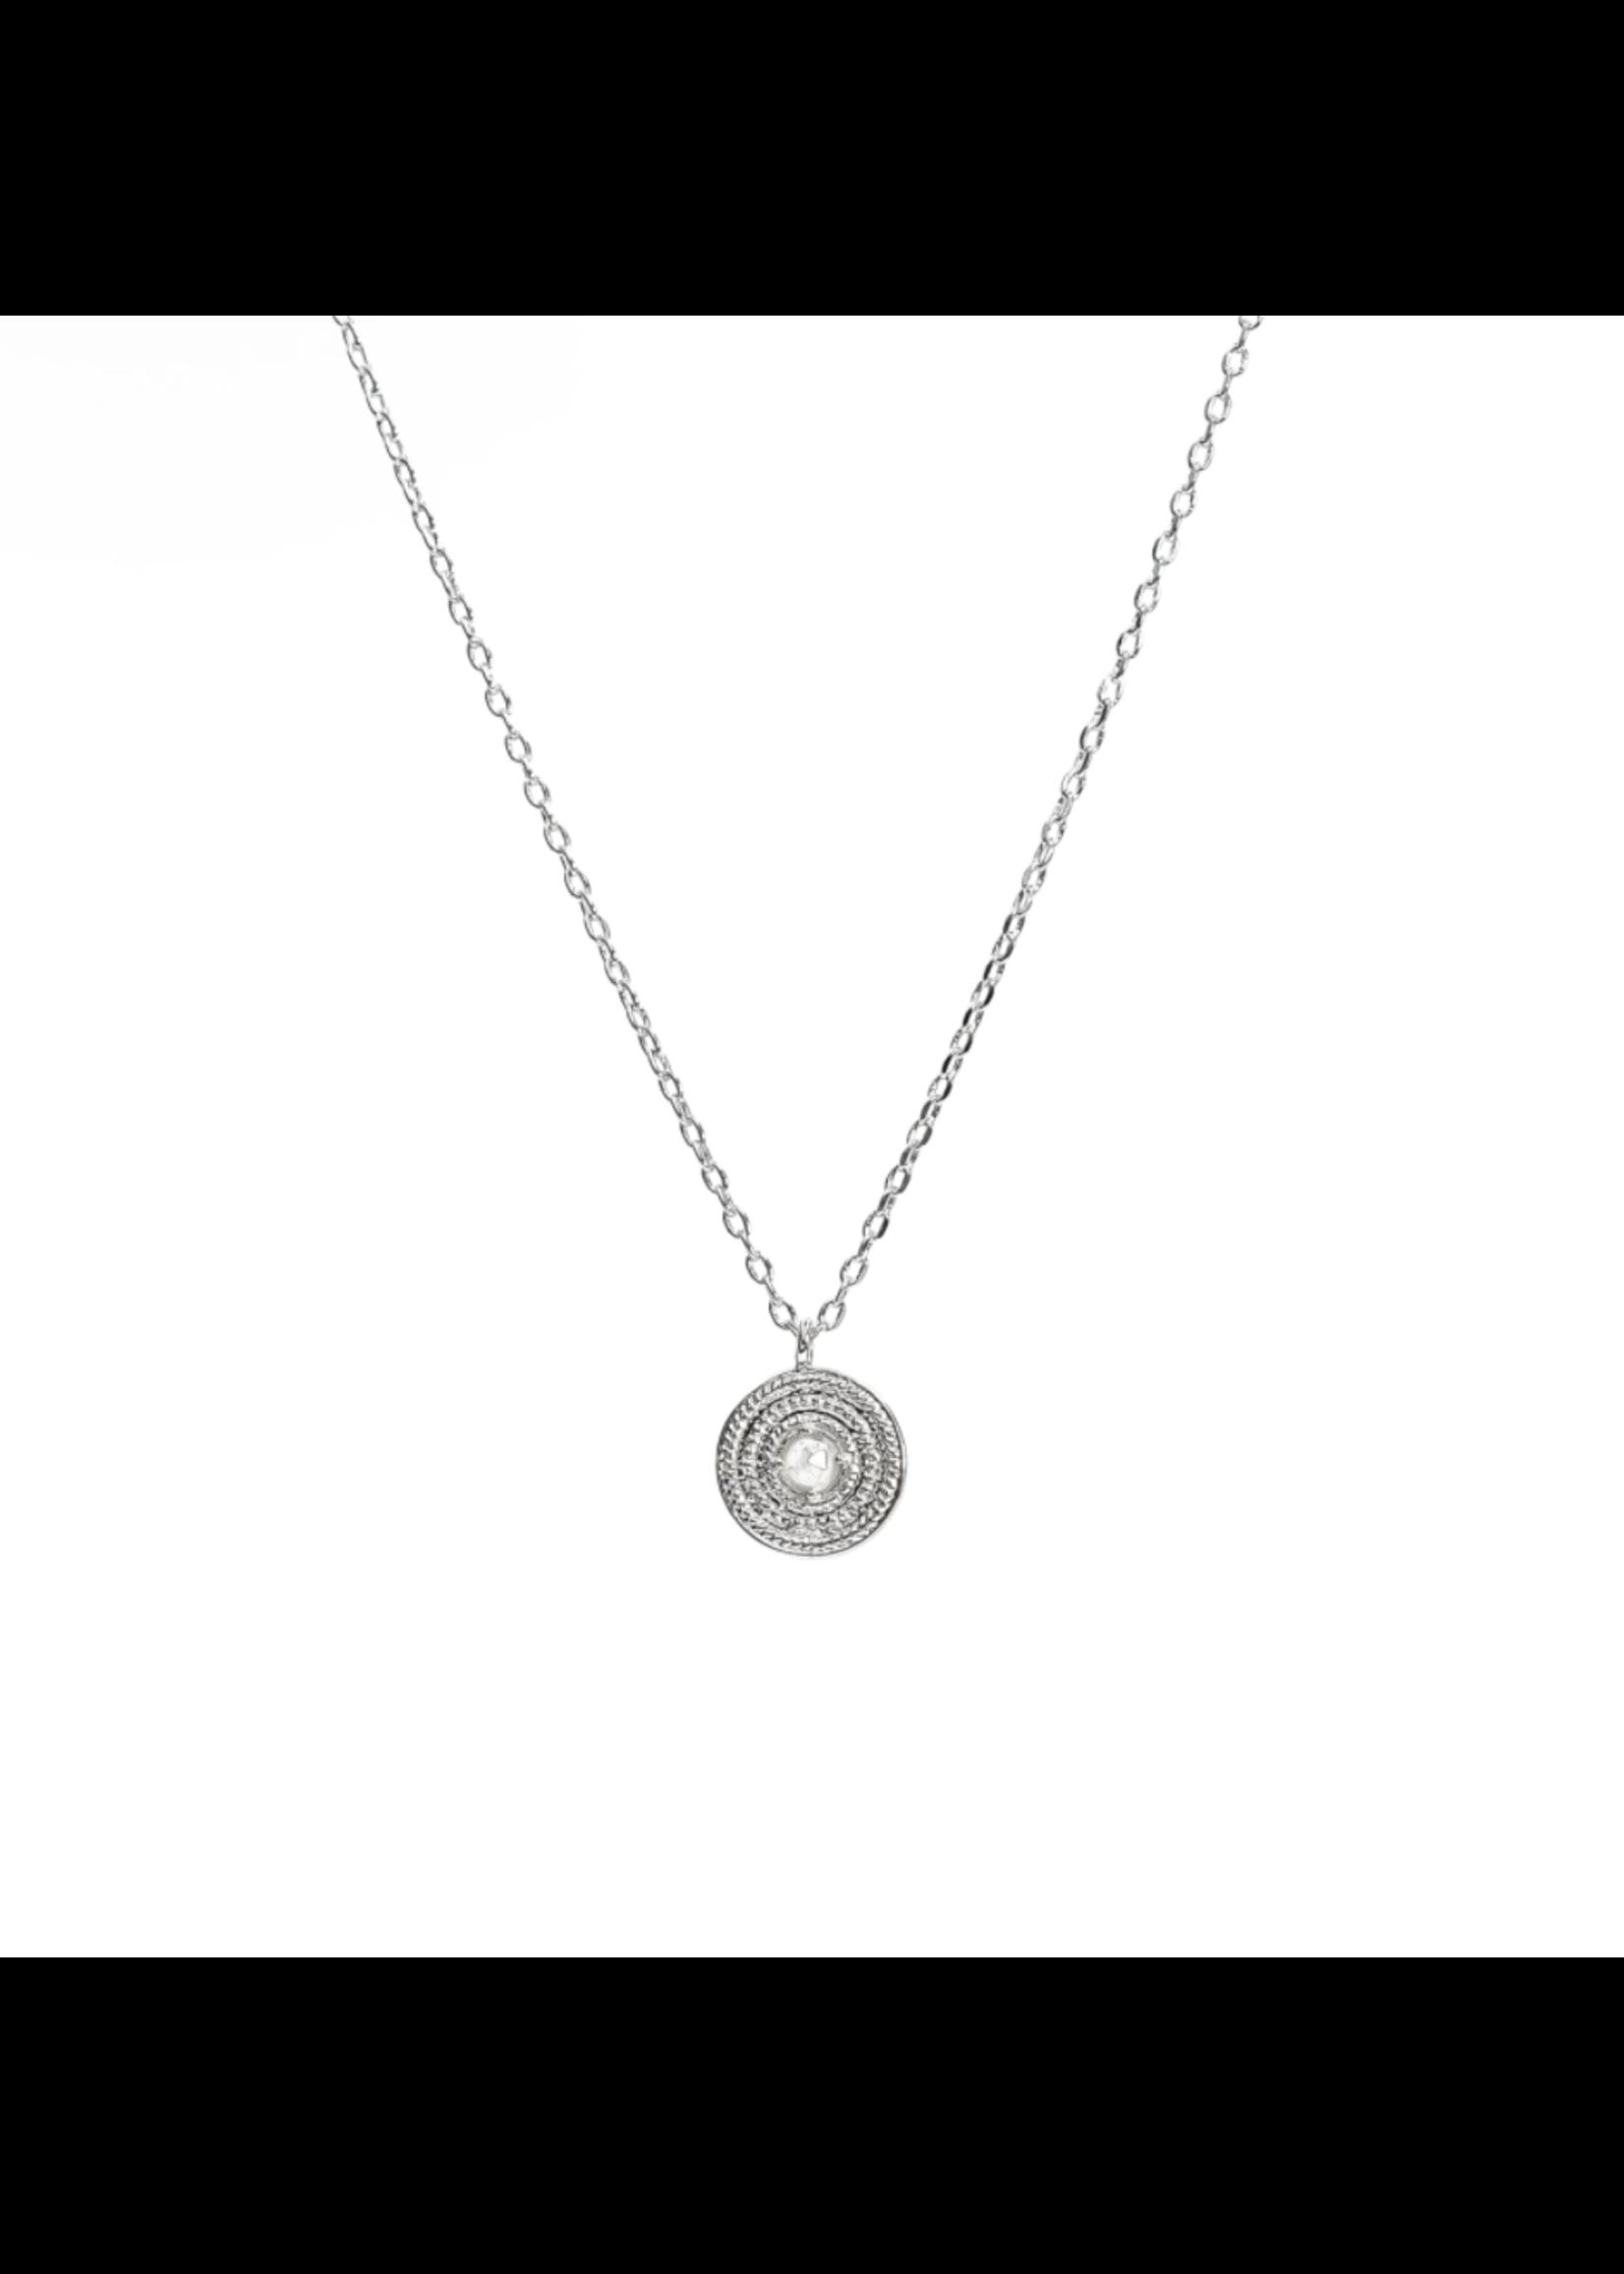 Soleil Necklace - Silver